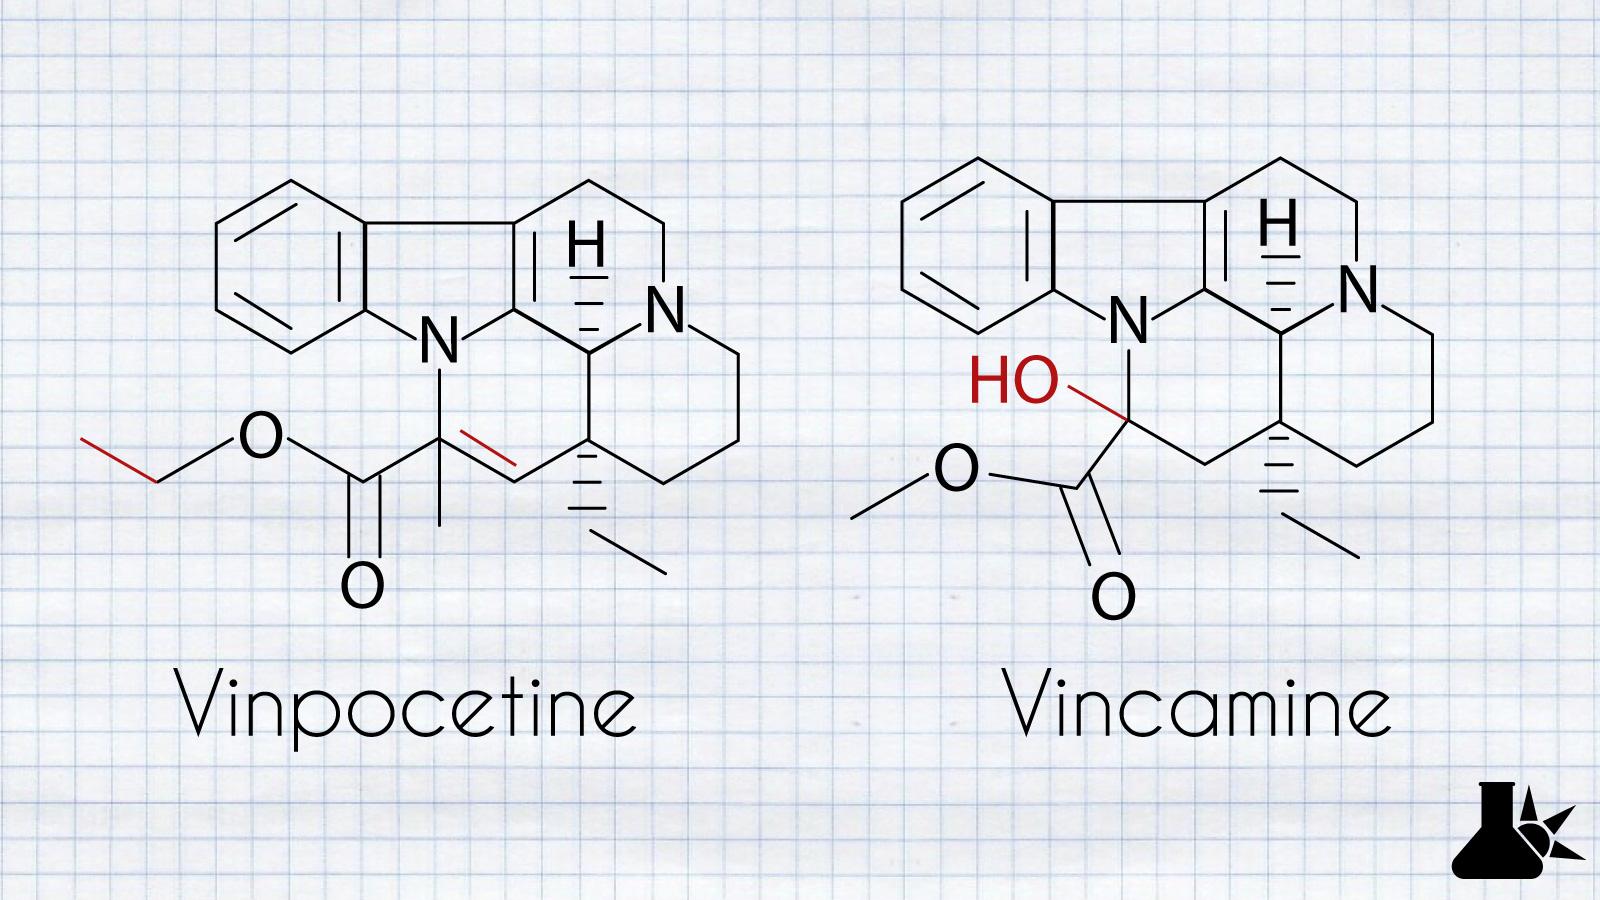 vinpocetine vs vincamide